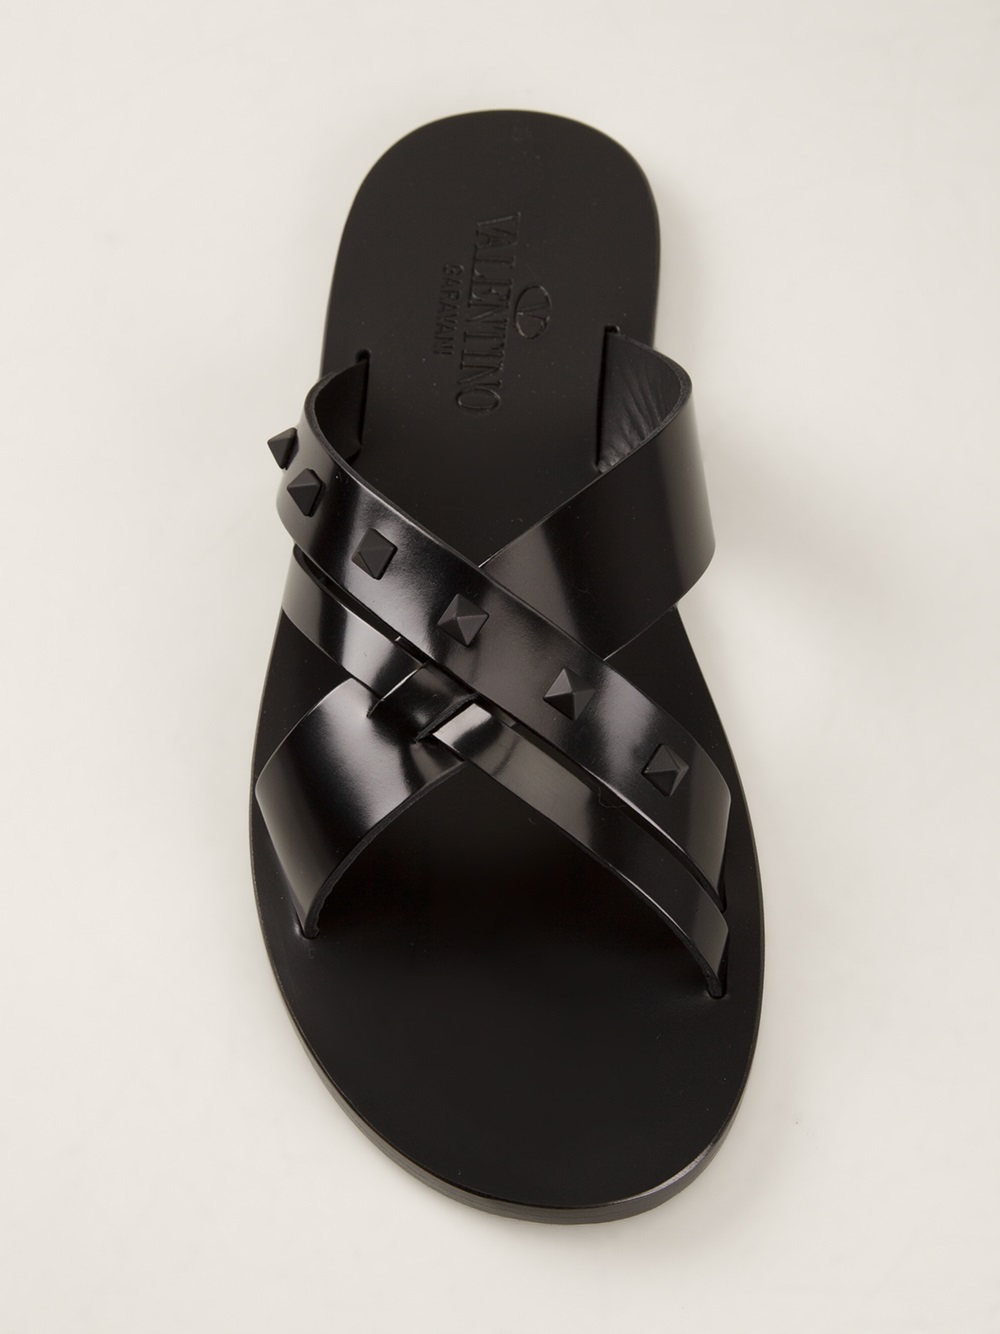 Valentino Black For Men Sandal Rockstud jzLpqUSVMG